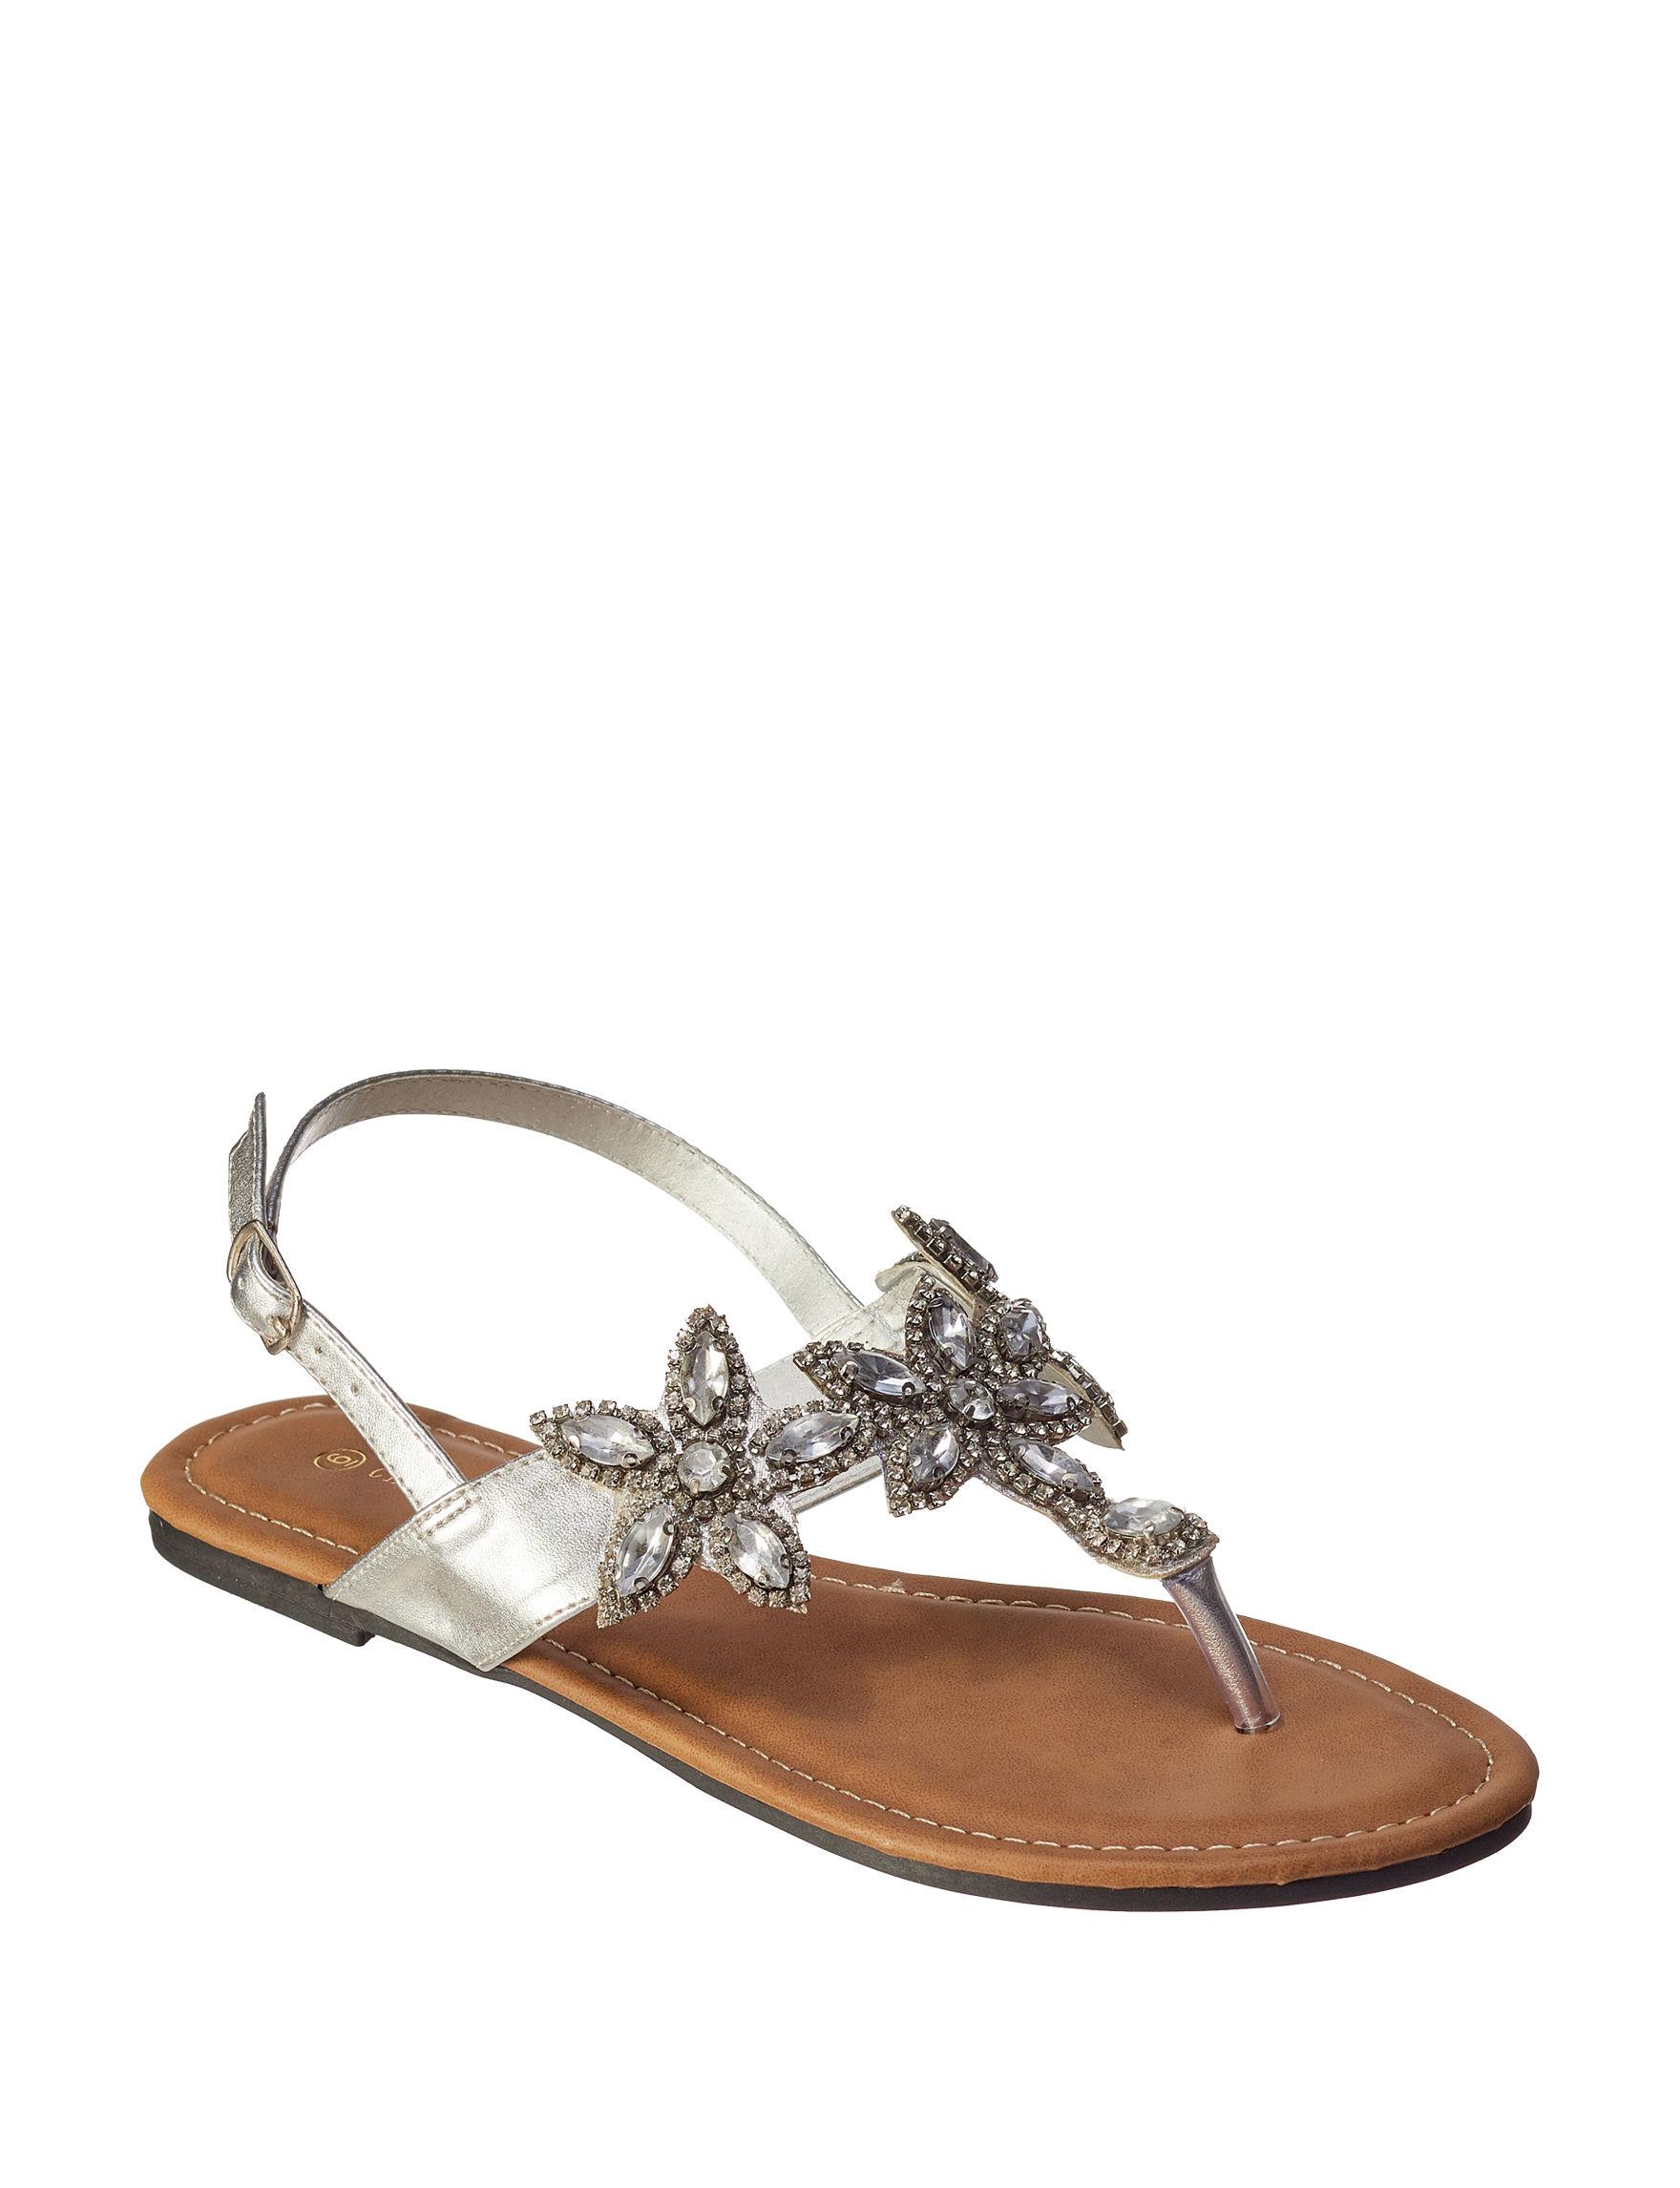 Charles Albert Silver Flat Sandals